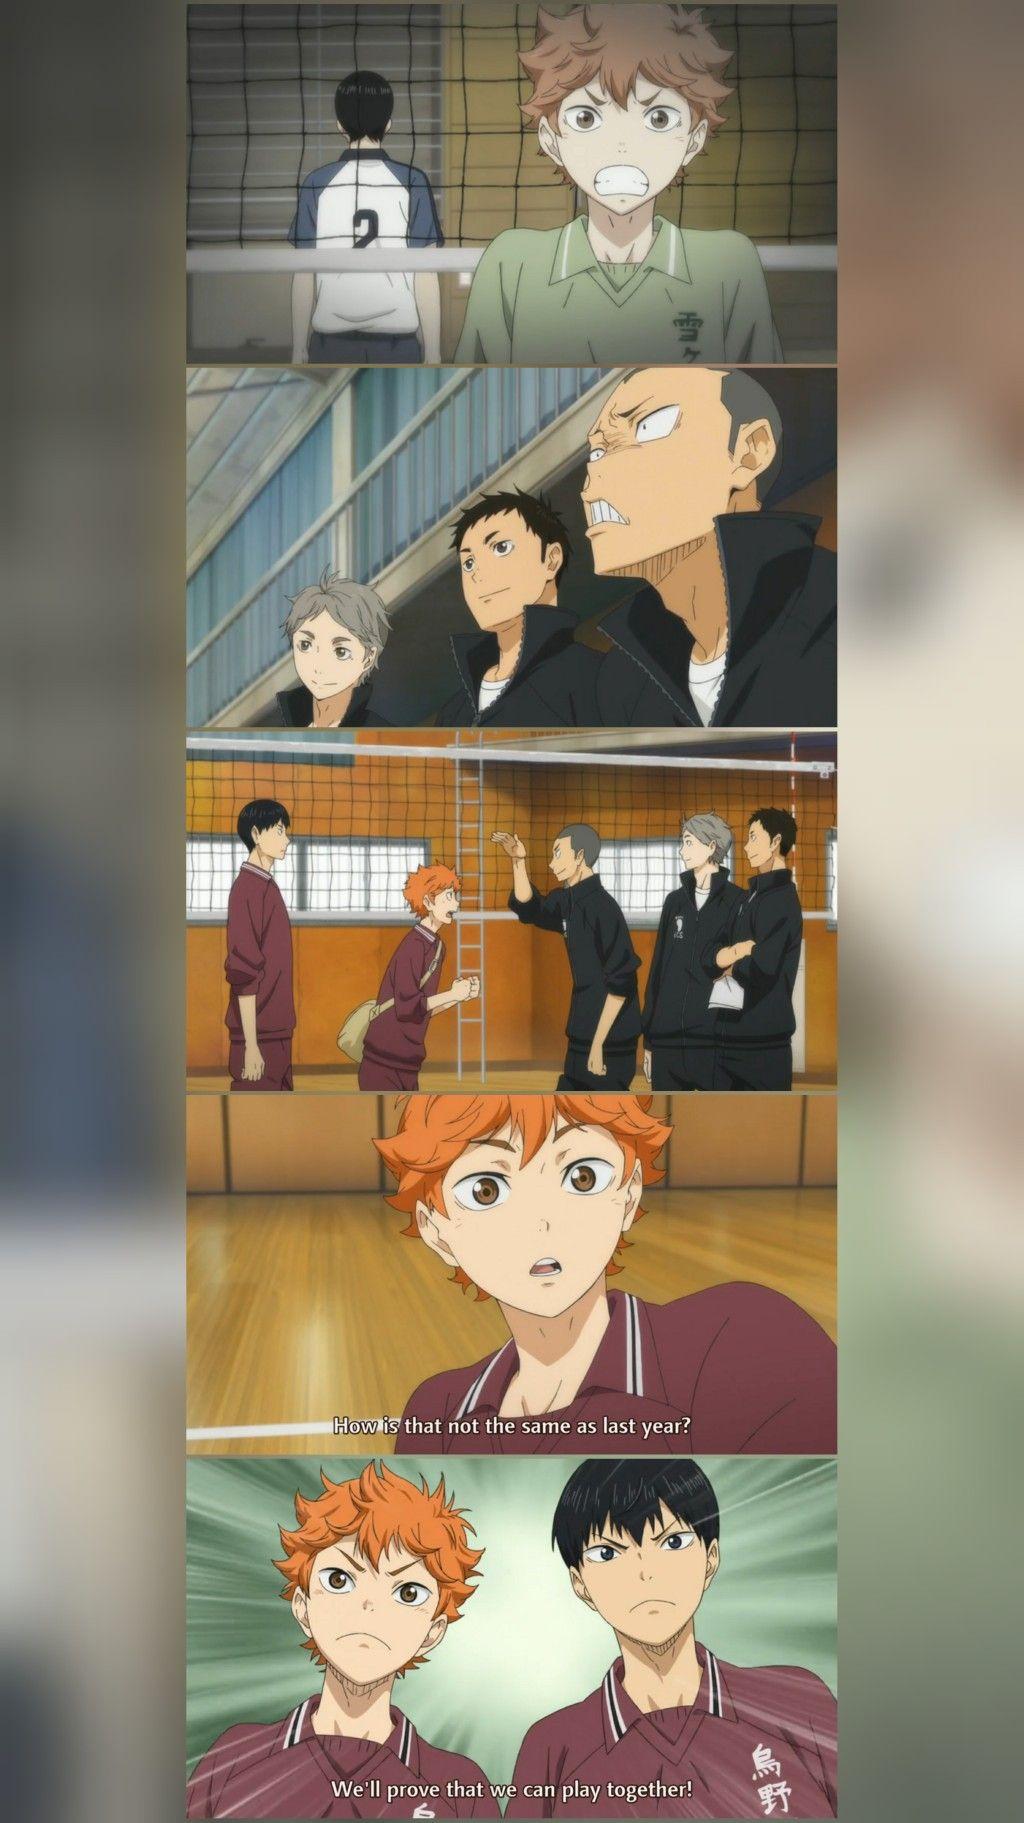 Karasuno High volley ball club in 2020 Anime, Haikyuu